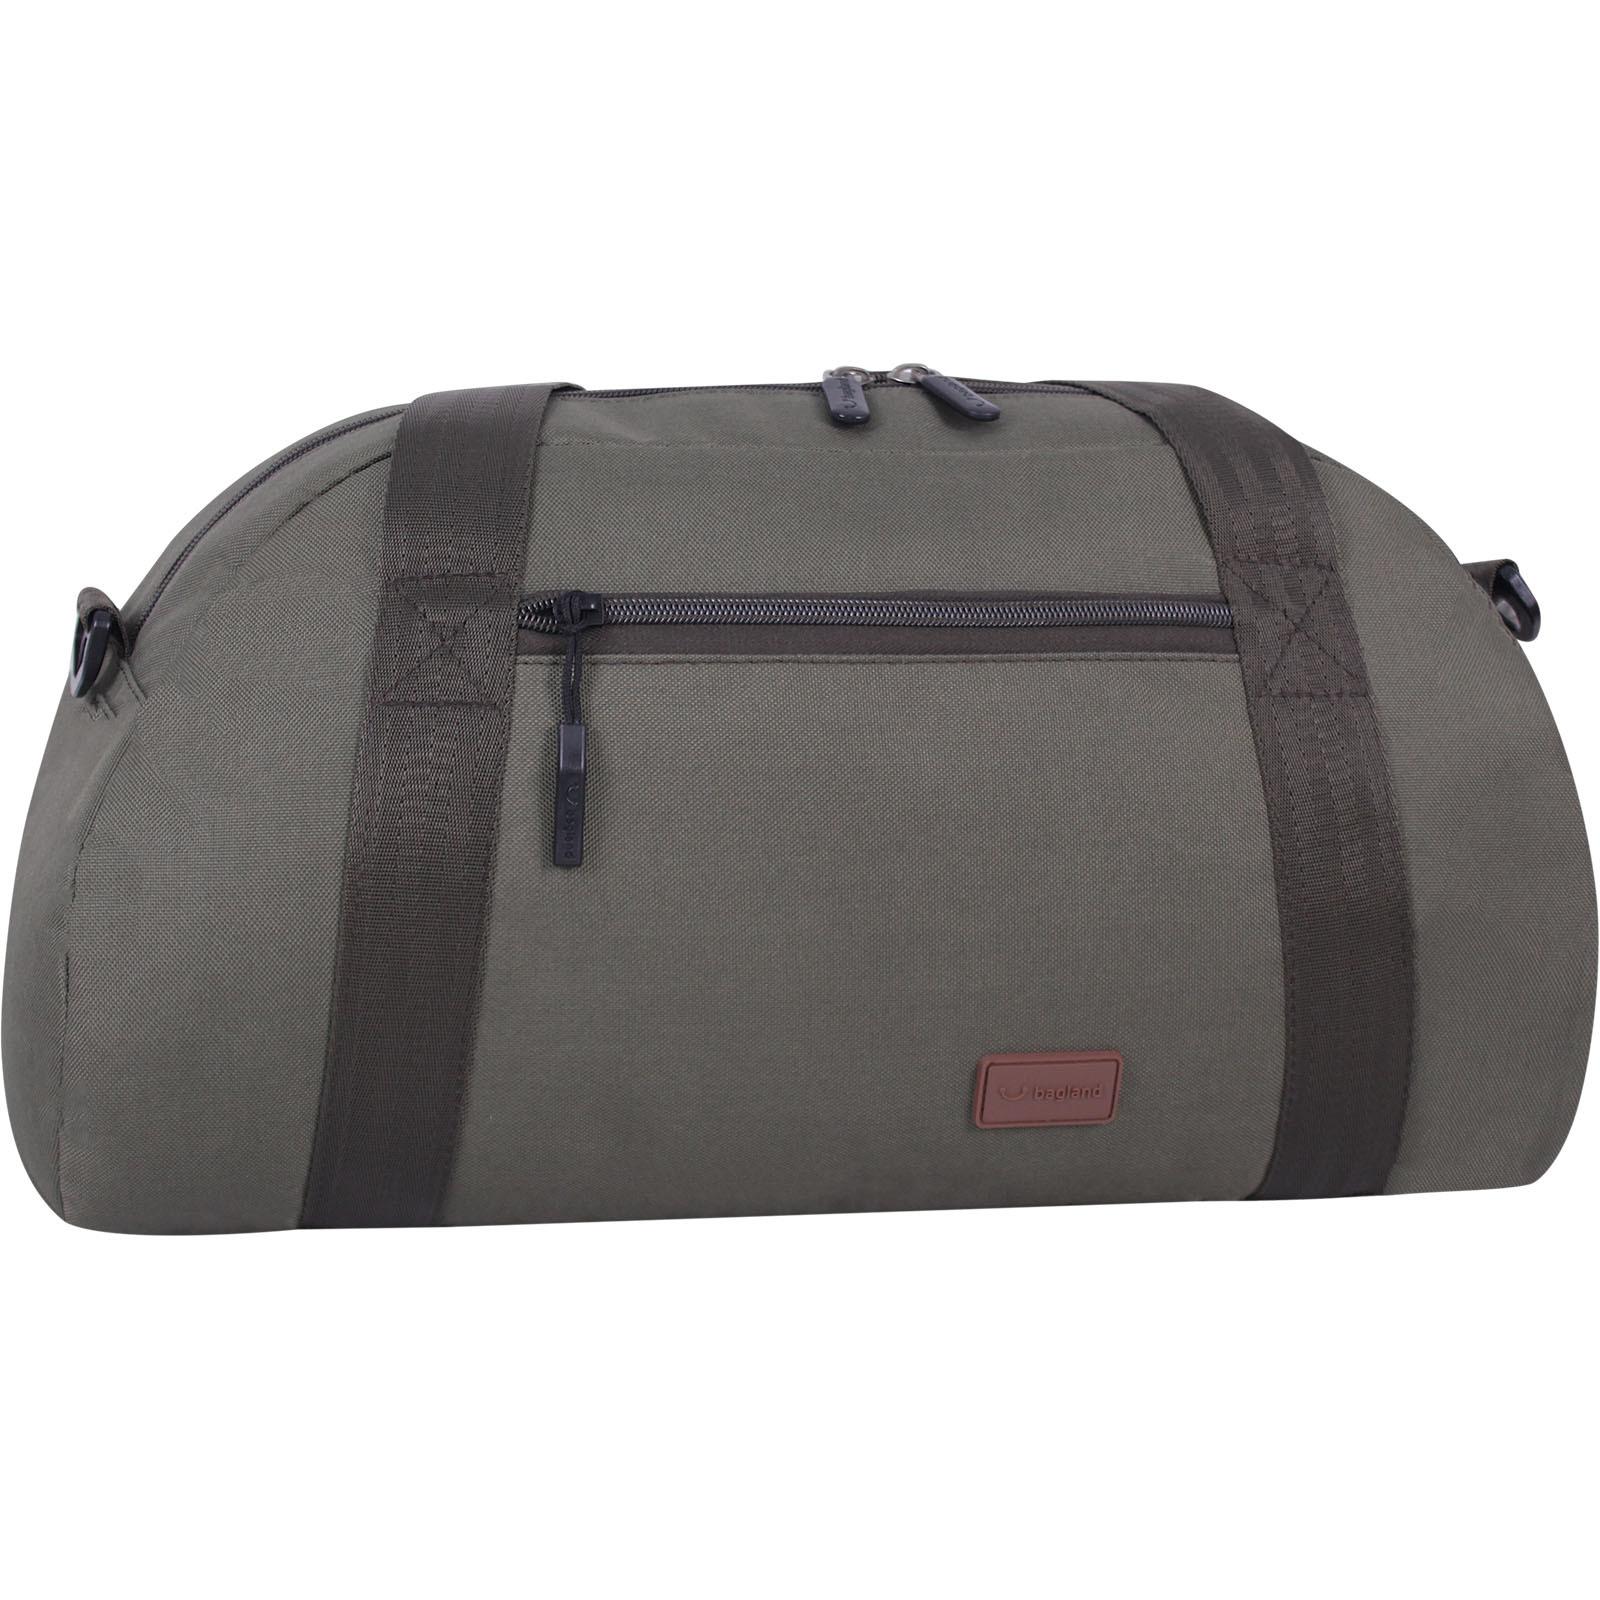 Спортивные сумки Сумка Bagland Oblivion 27 л. Хаки (0037366) IMG_6310-1600.jpg